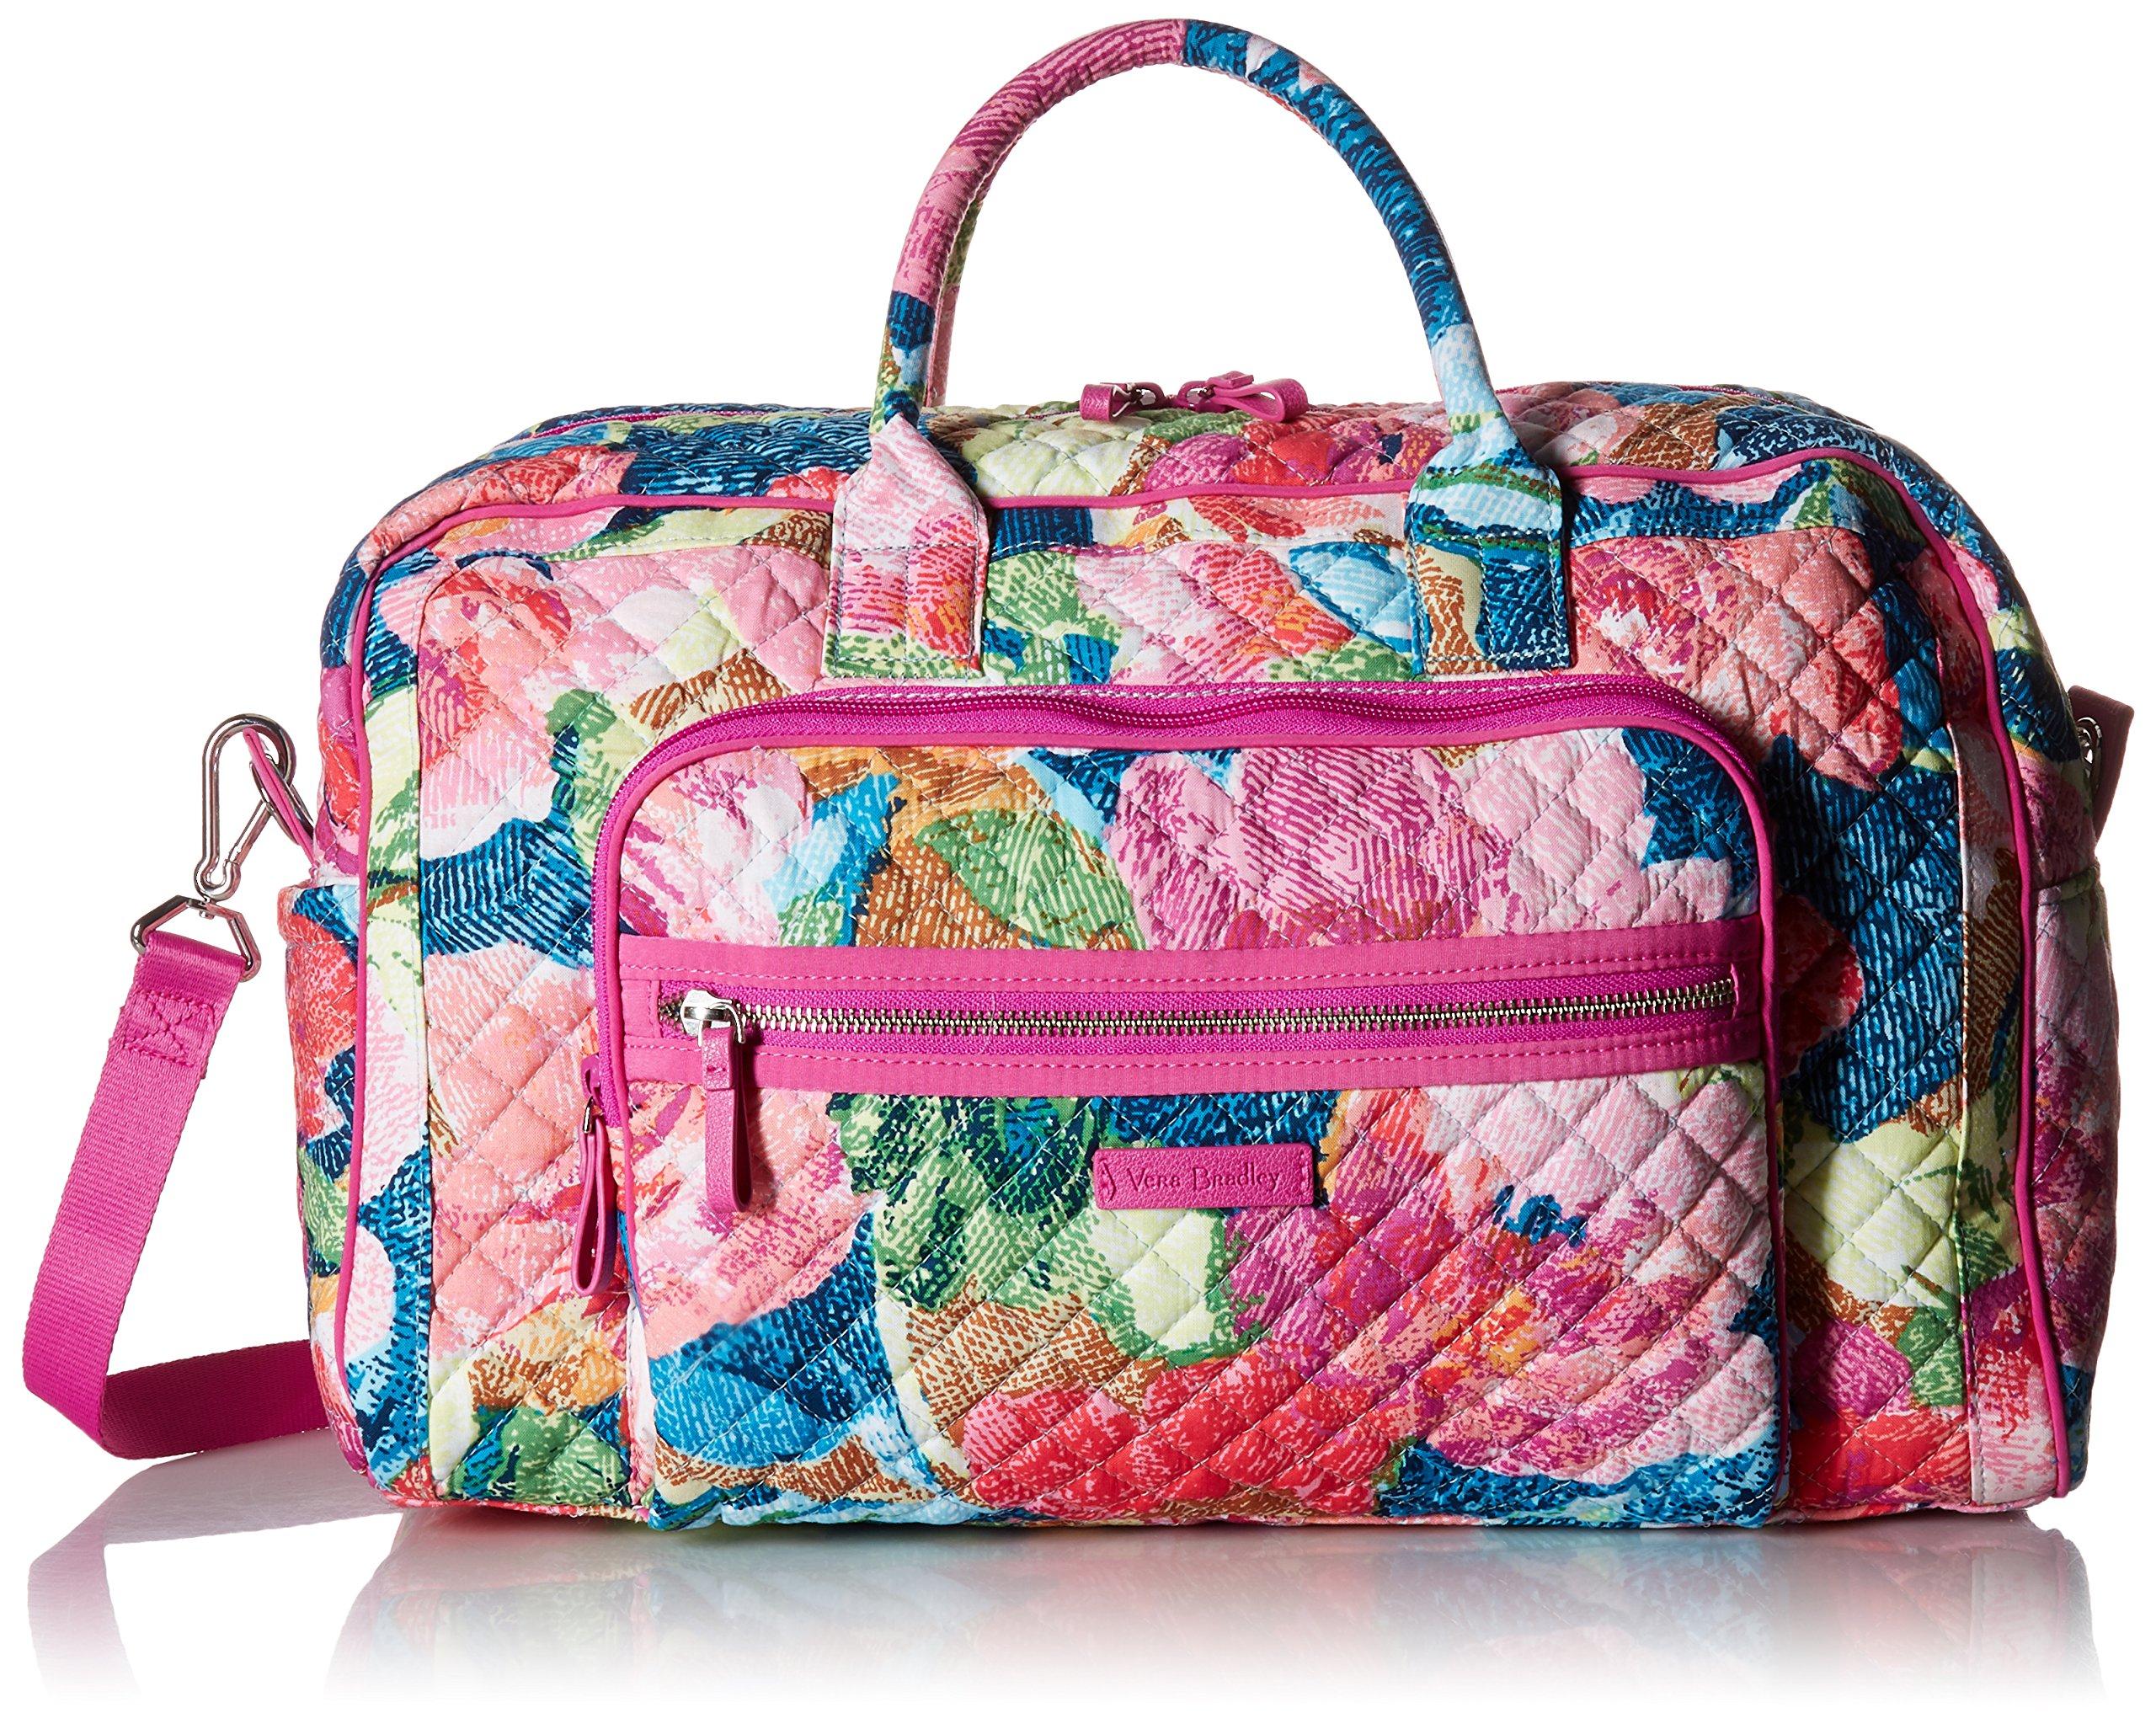 Vera Bradley Iconic Compact Weekender Travel Bag, Signature Cotton, Superbloom